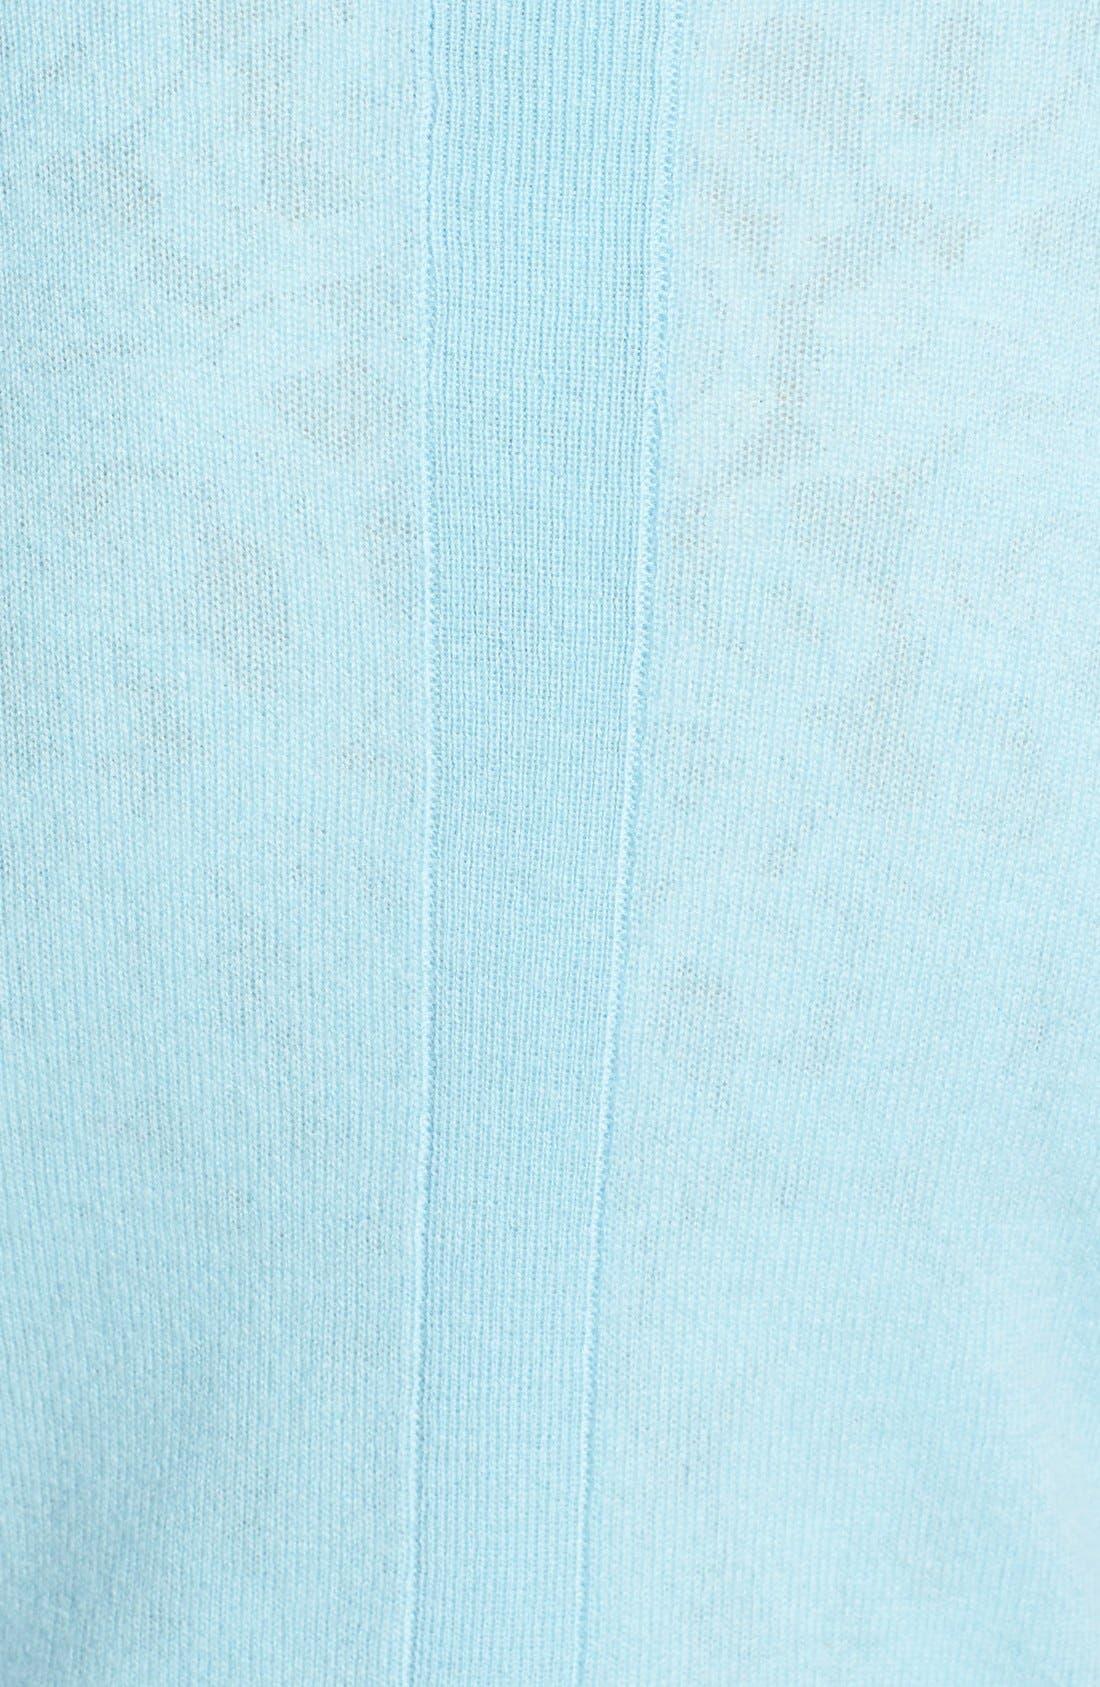 Alternate Image 3  - Halogen® Lightweight Cashmere Crewneck Sweater with Pocket